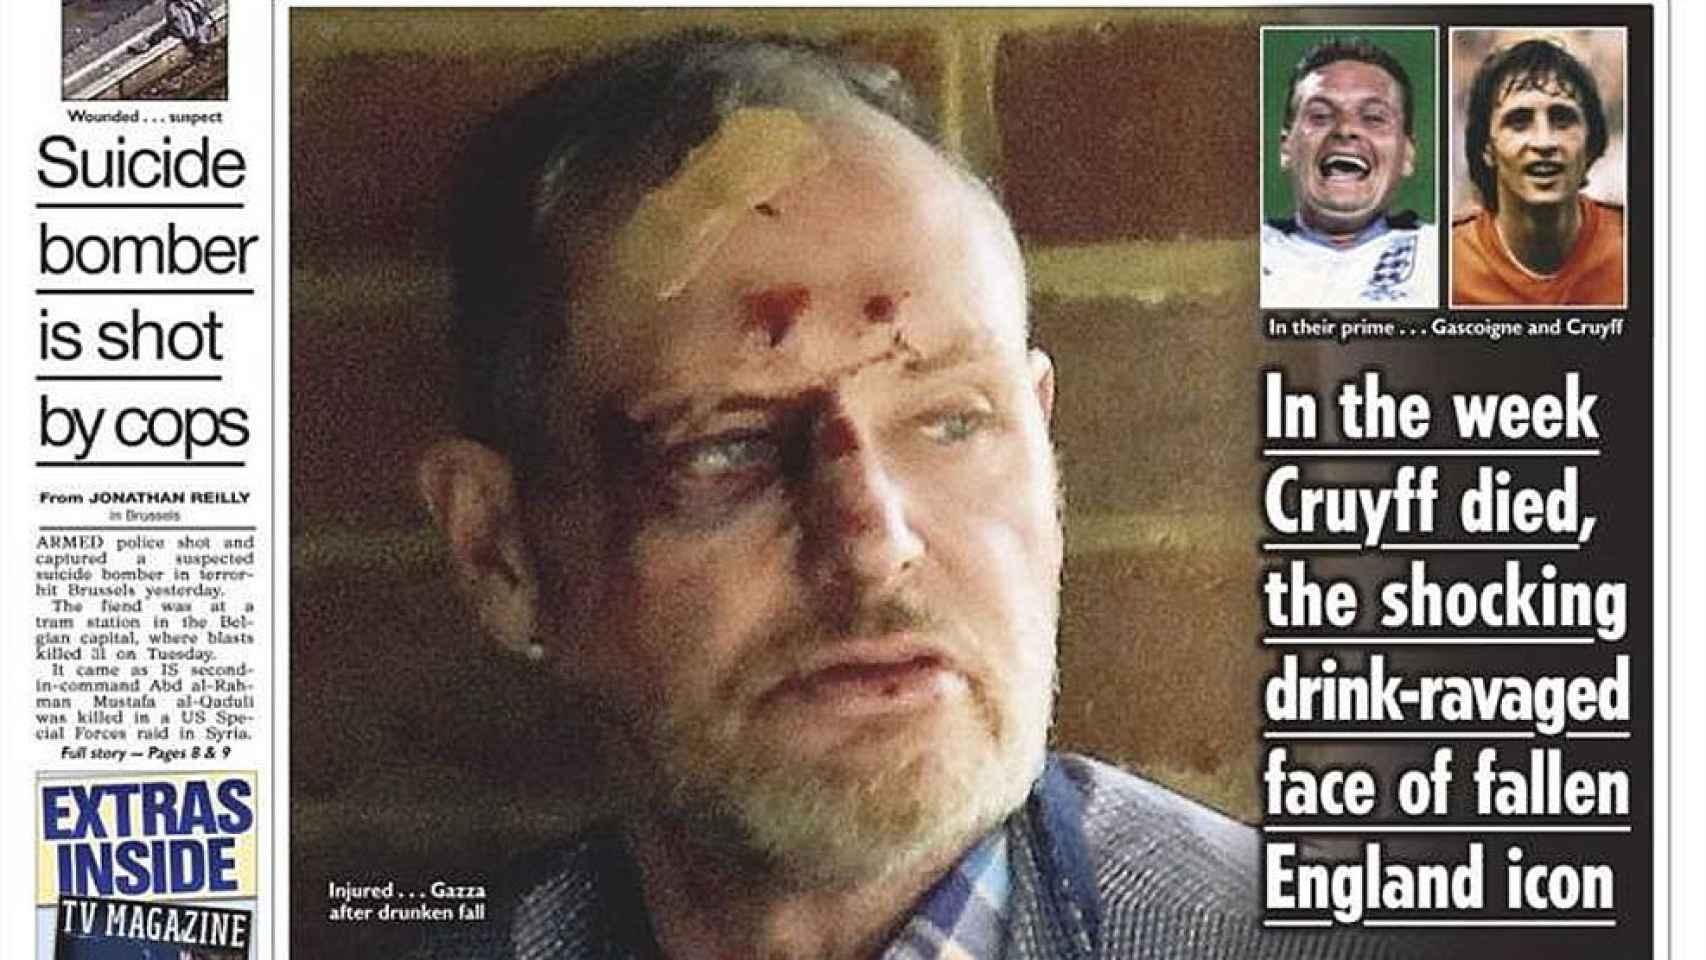 Paul Gascoigne deambula borracho y ensangrentado por la calle